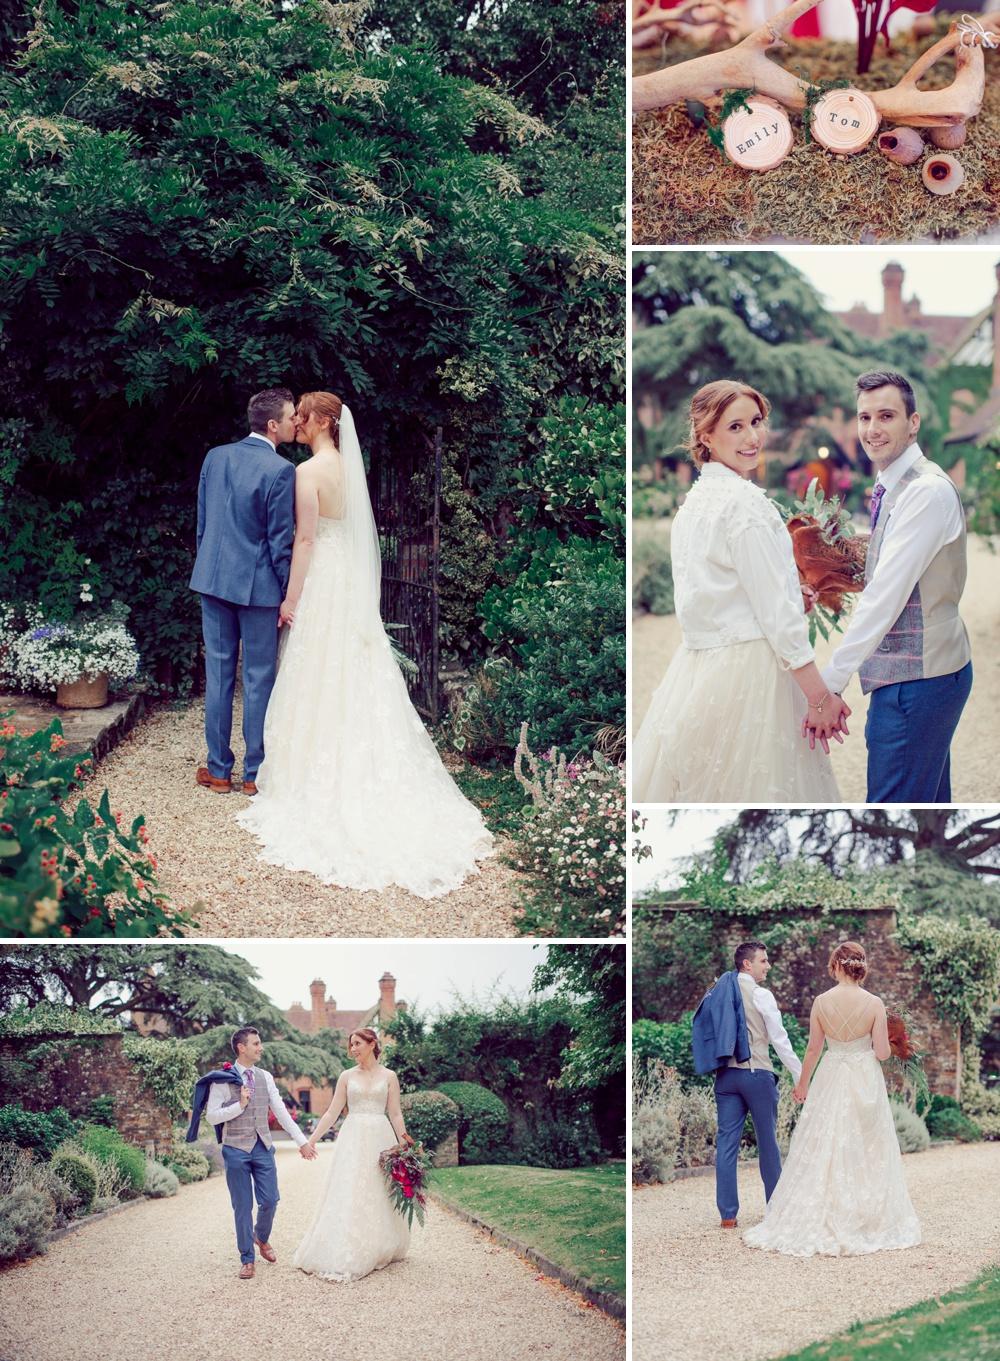 Wedding at Careysmanor in the Newforest Bride & Groom photography in Gardens